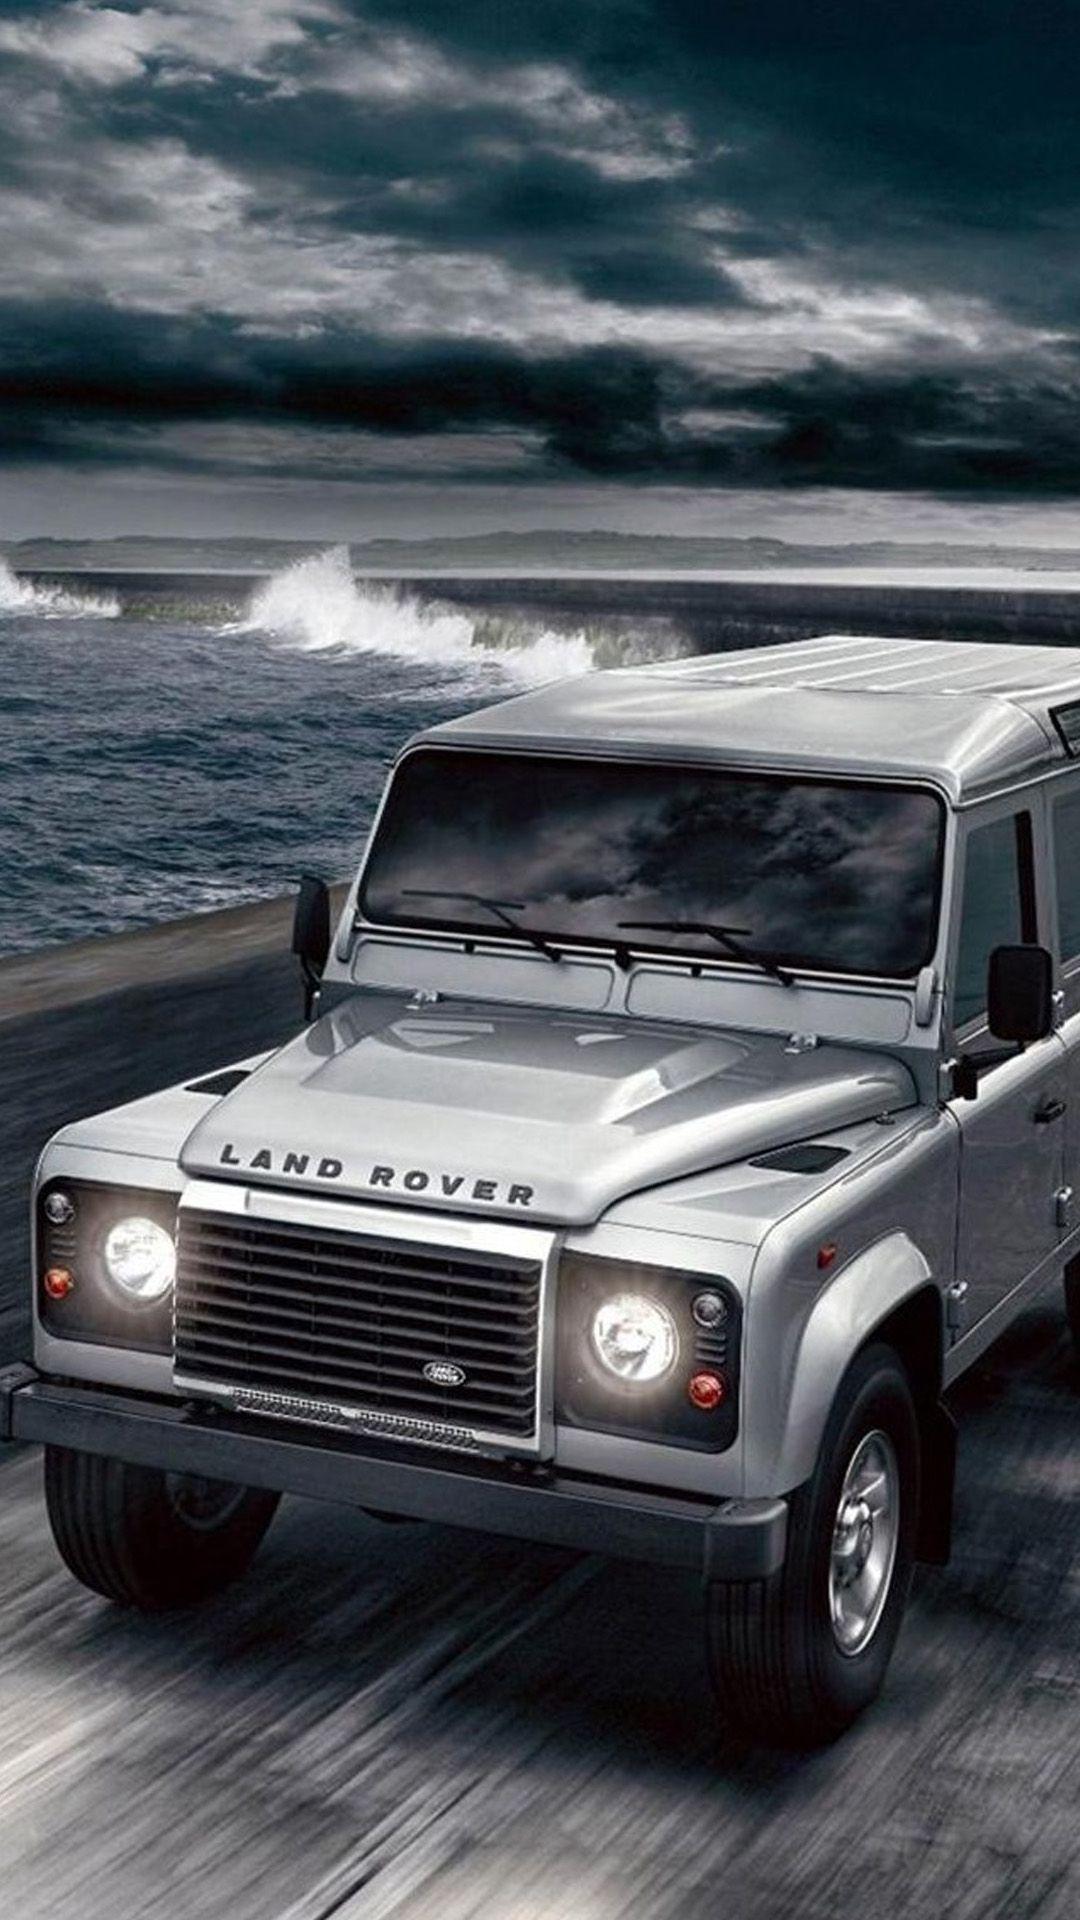 Ocean Shore Land Rover Iphone 6 Plus Wallpaper Land Rover Land Rover Defender Iphone 6 Wallpaper